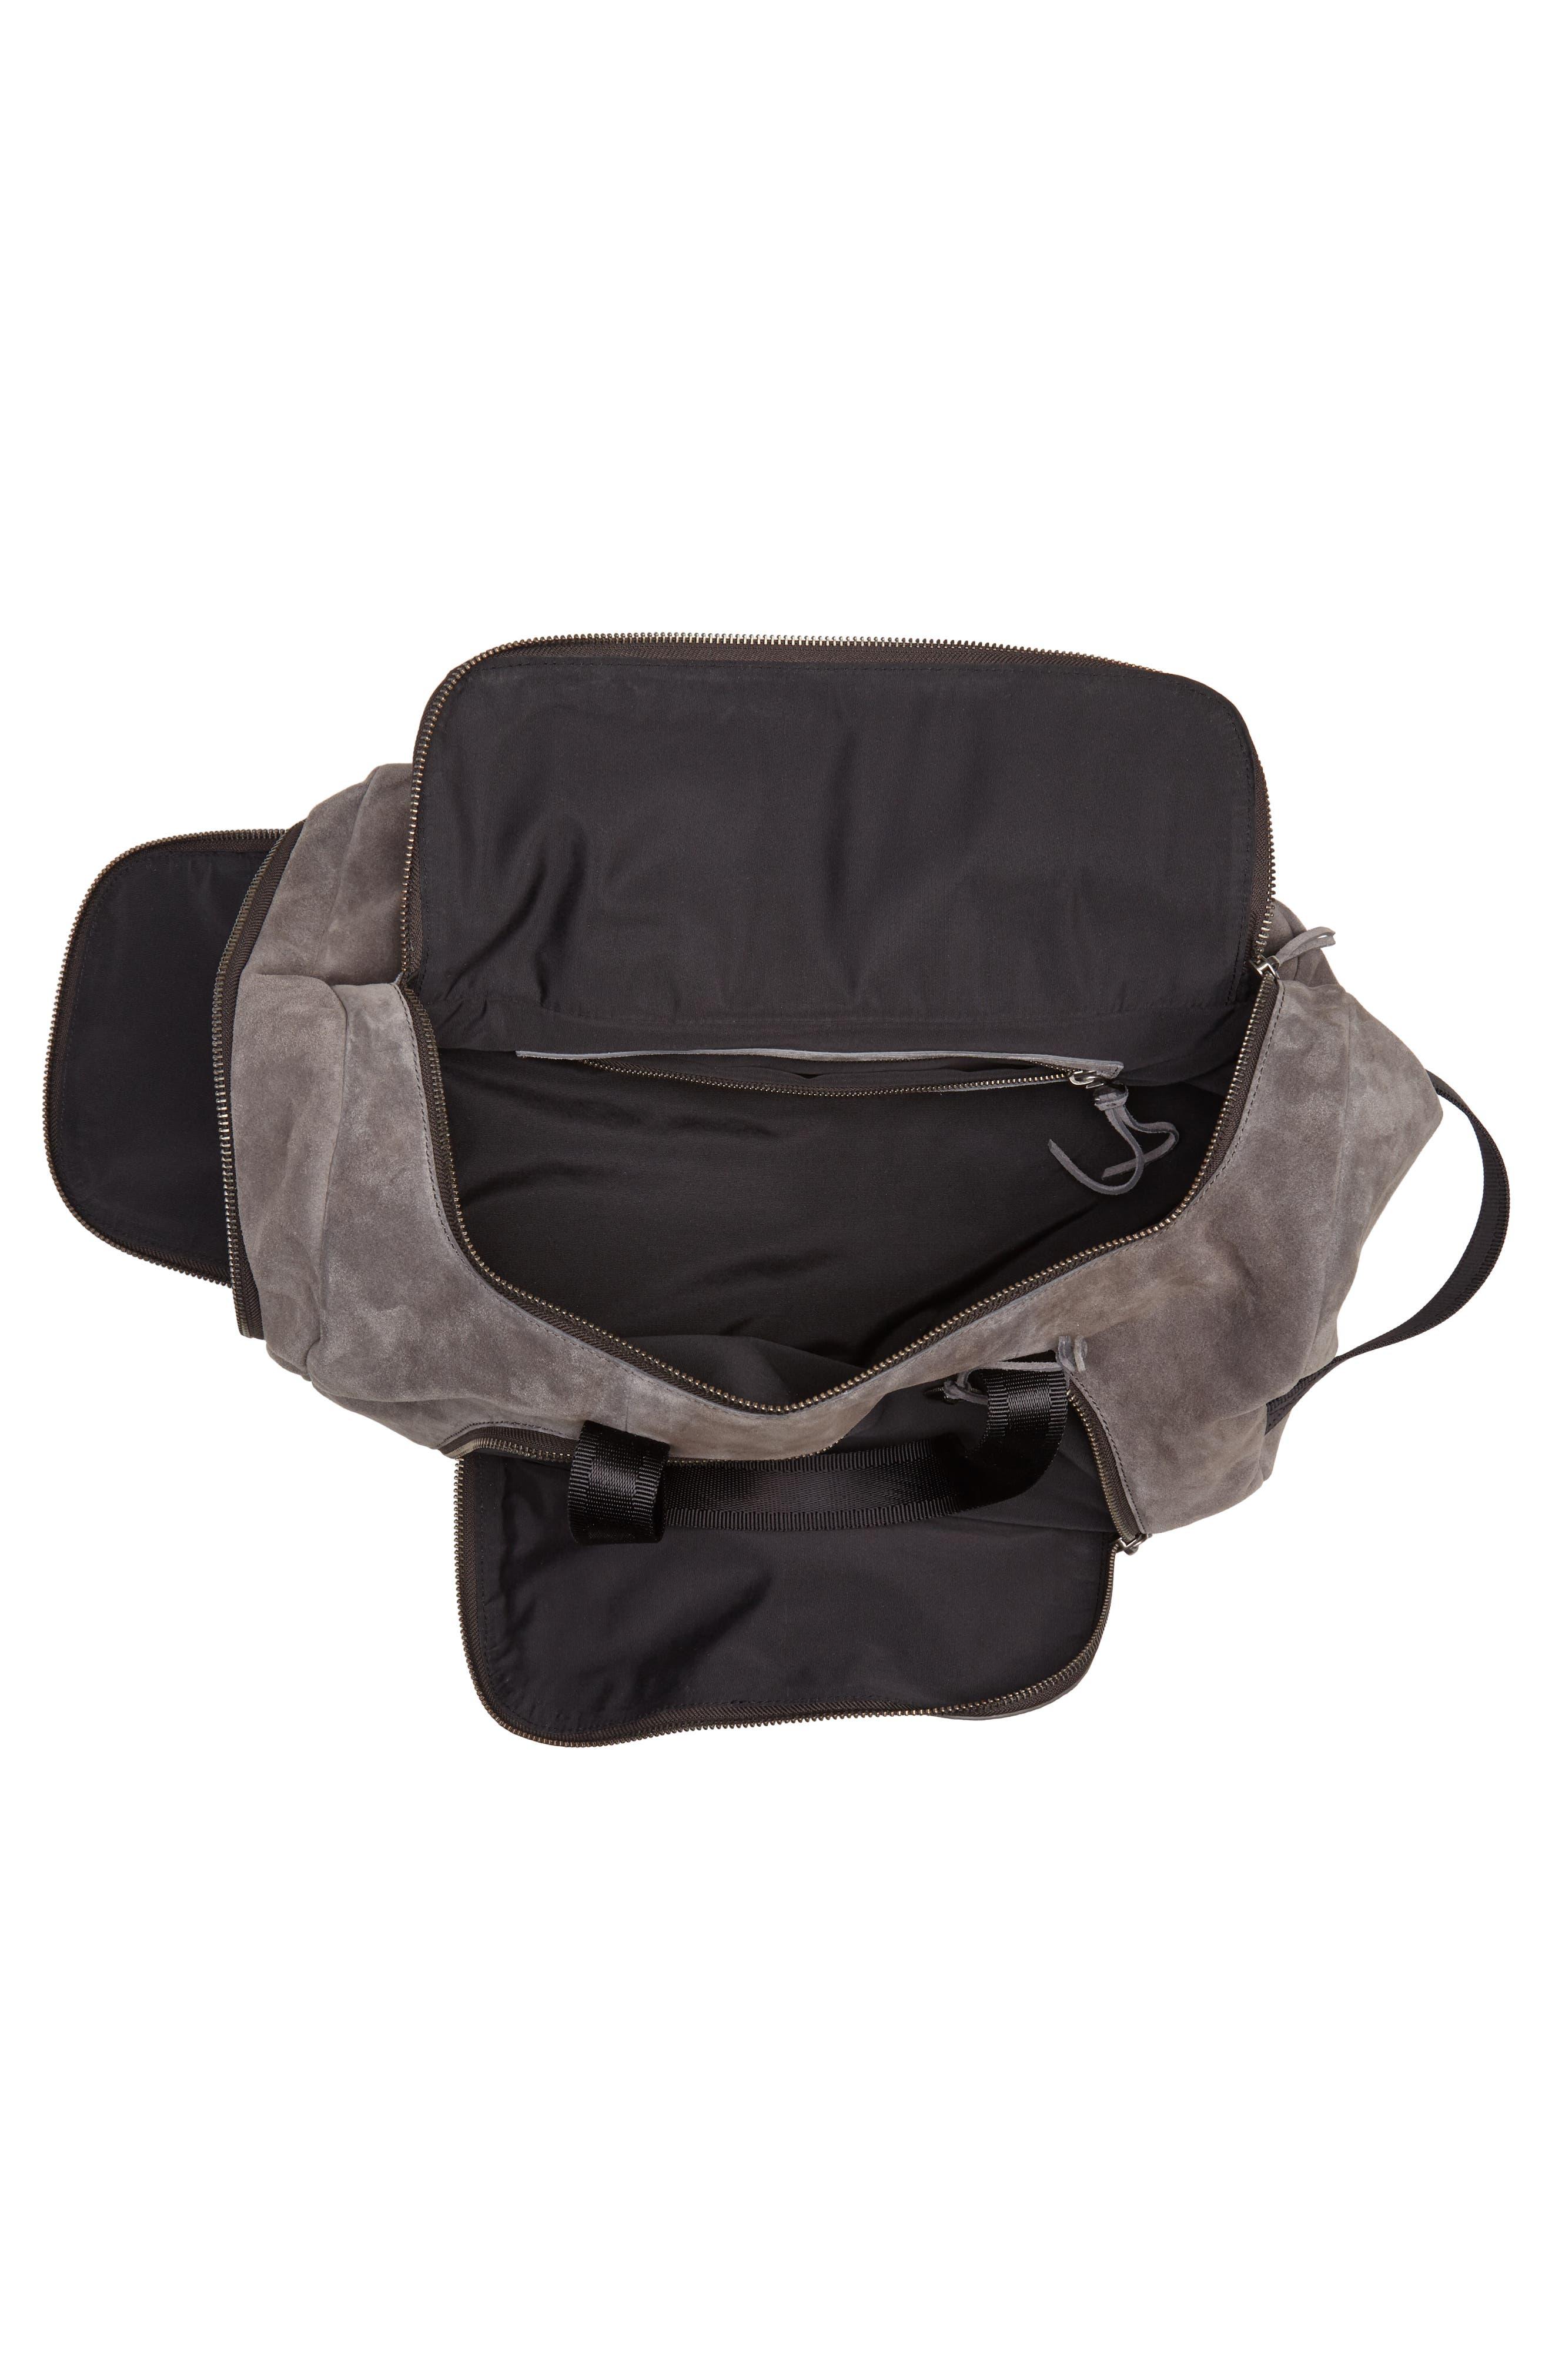 Brooklyn Suede Convertible Duffel Bag,                             Alternate thumbnail 5, color,                             Lead